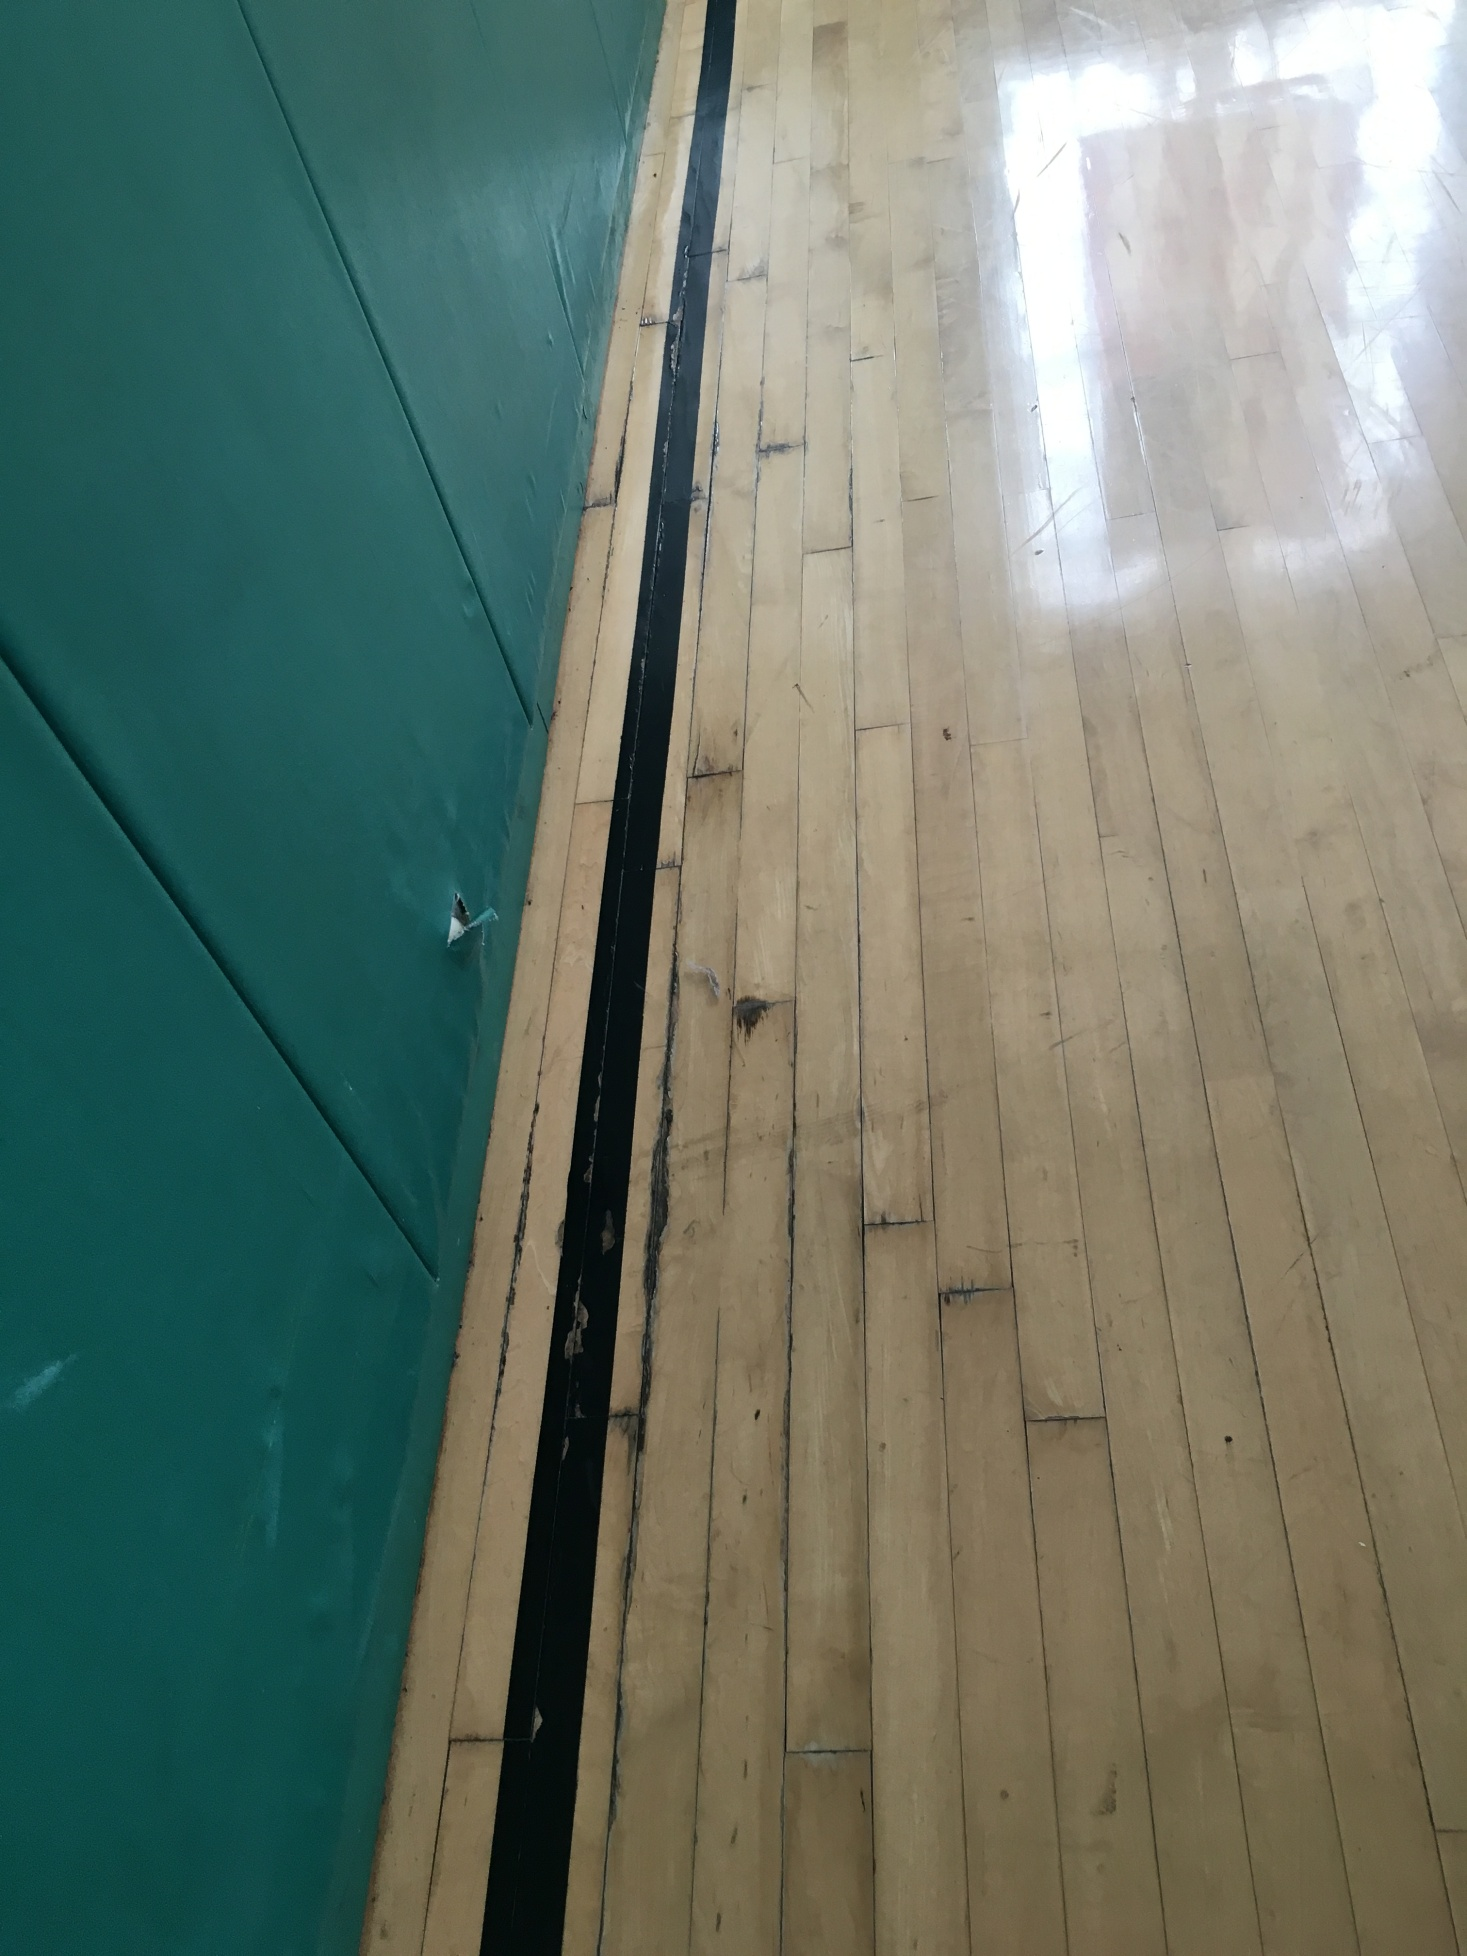 603 Damaged floor